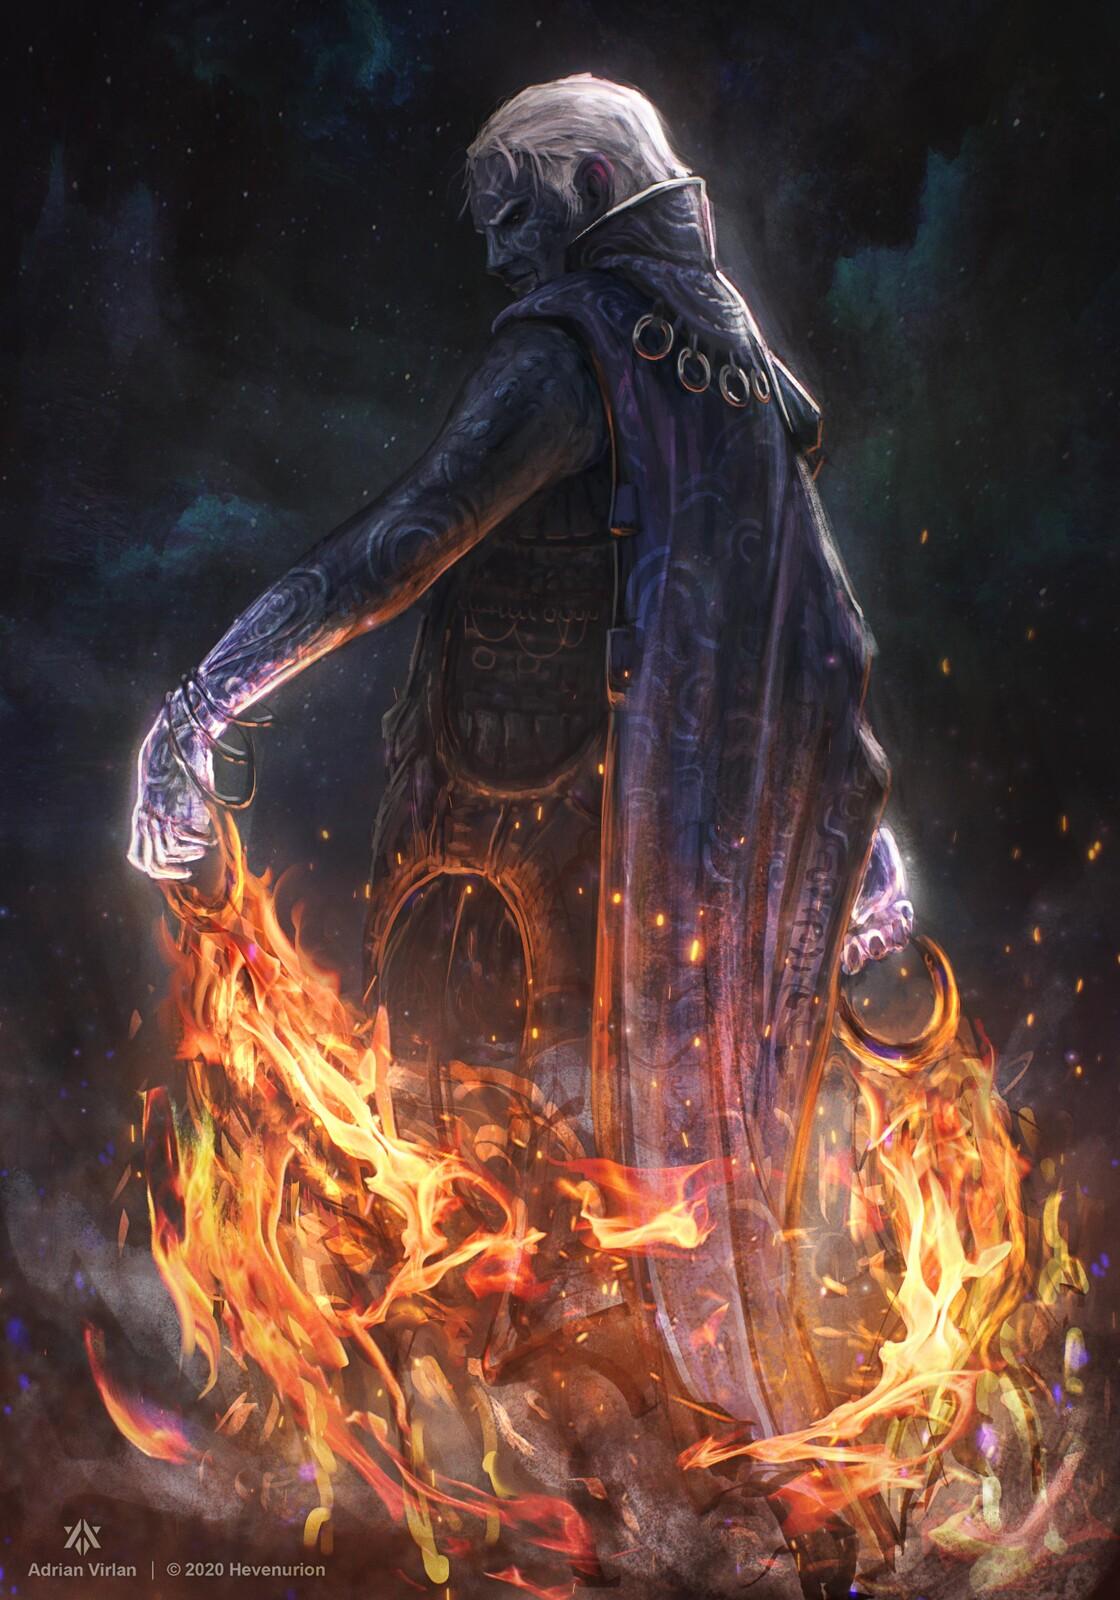 Ga'an - Hevenurion Character